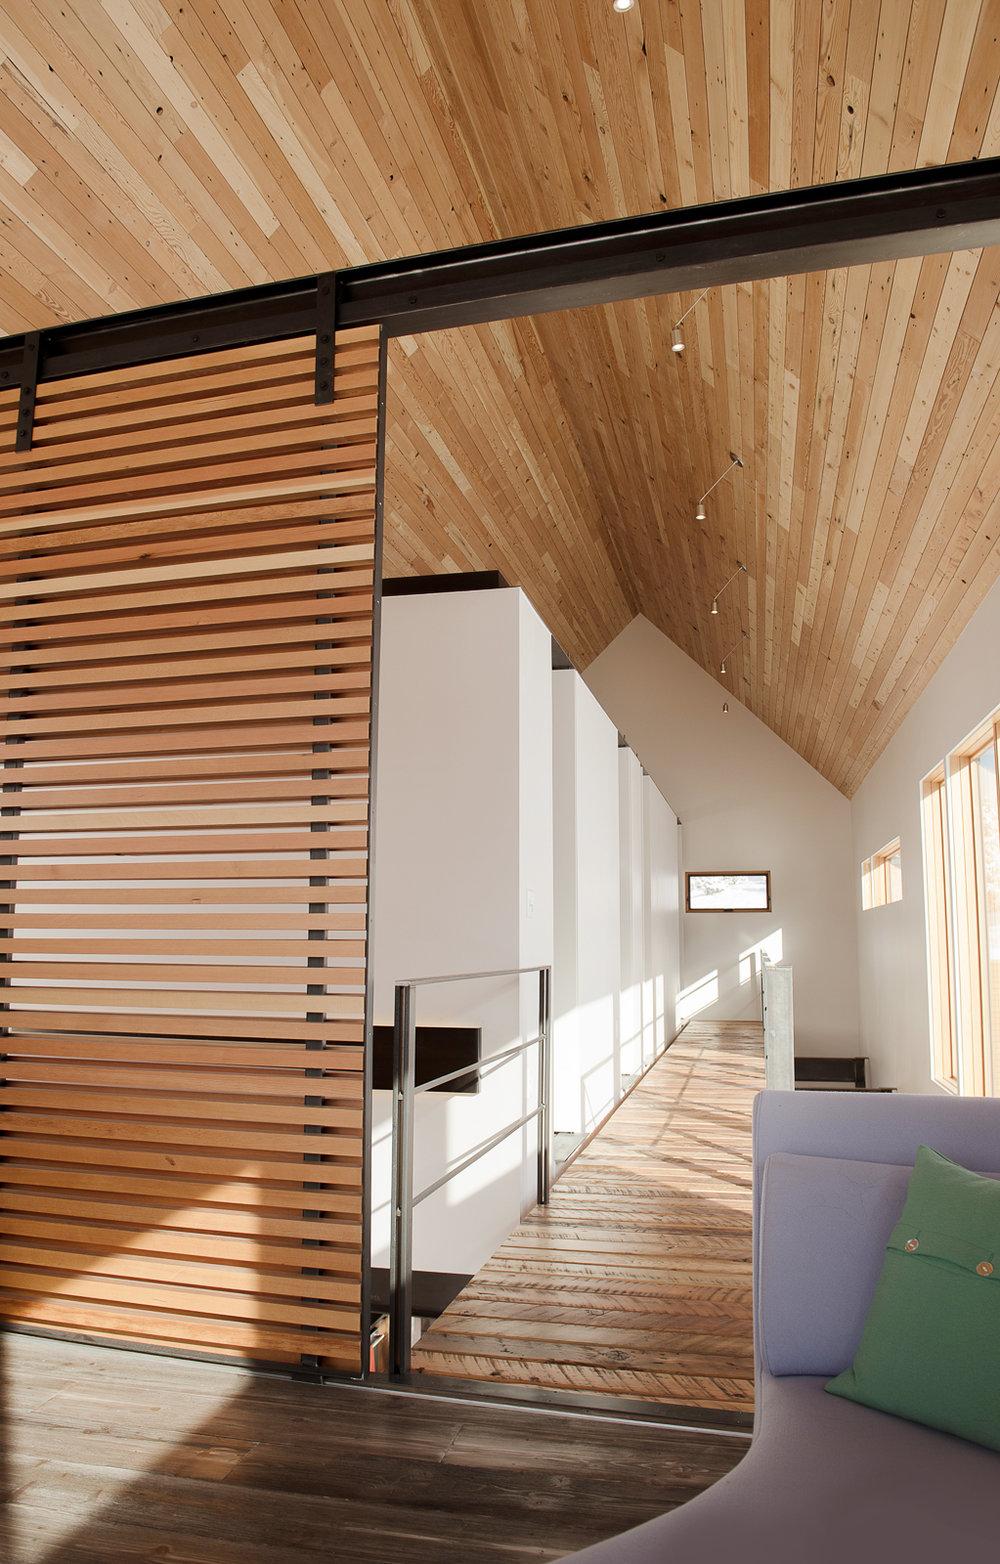 Woodworks-West-Bozeman-Montana-Builder-Cabinetry-Remodel-New-Construction-4504.jpg